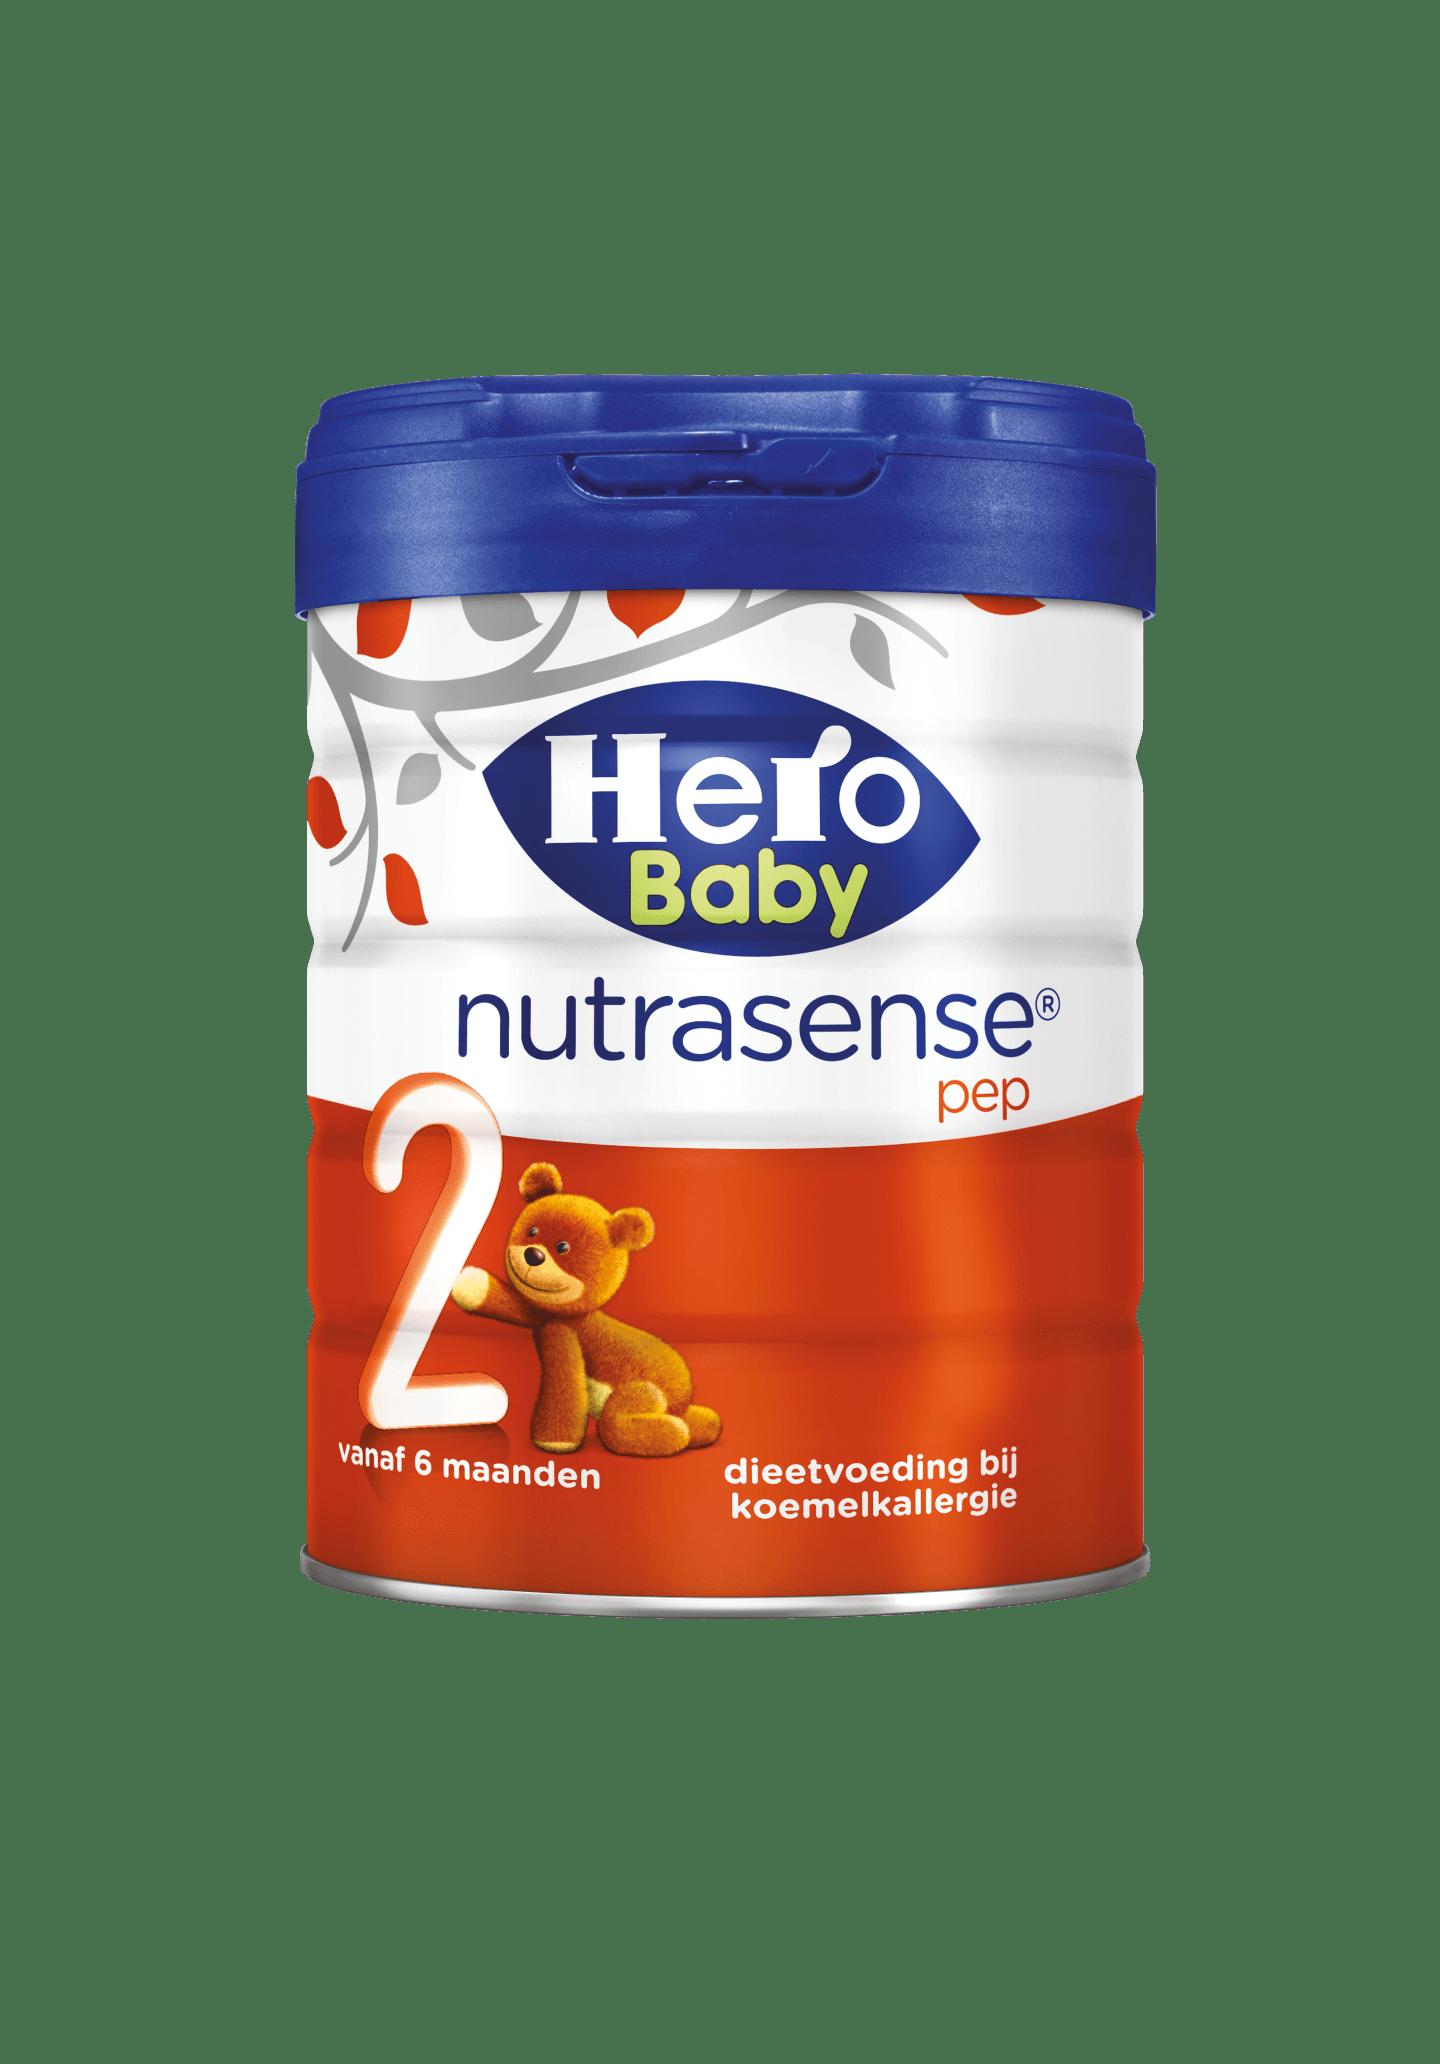 Hero Baby Nutrasense® Pep 2